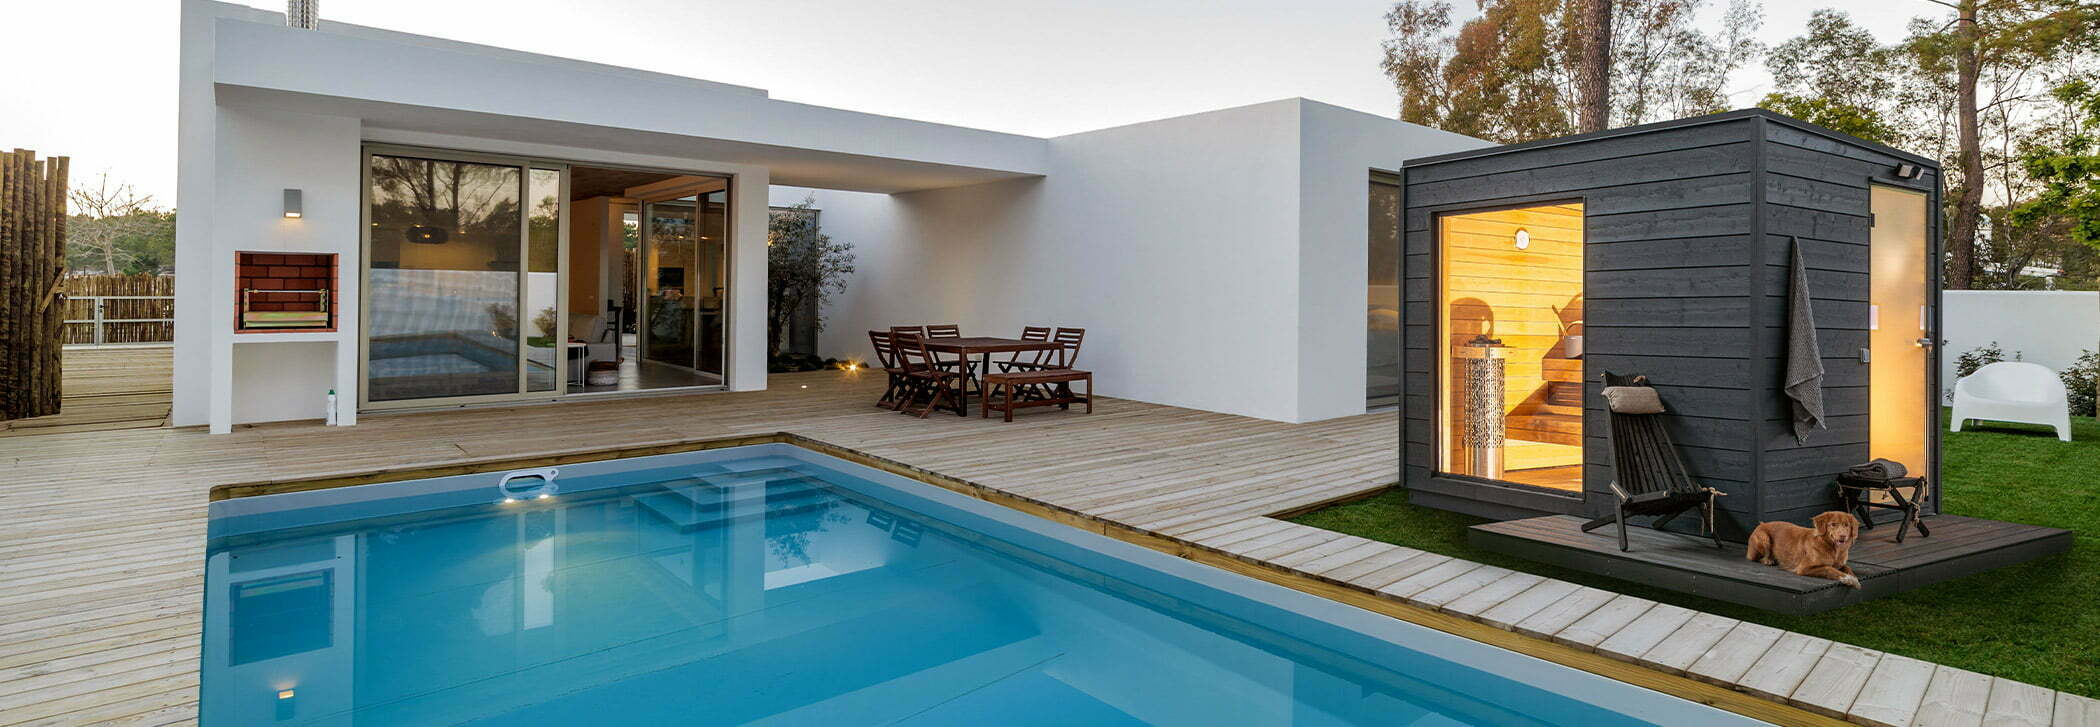 Saunahus-pool